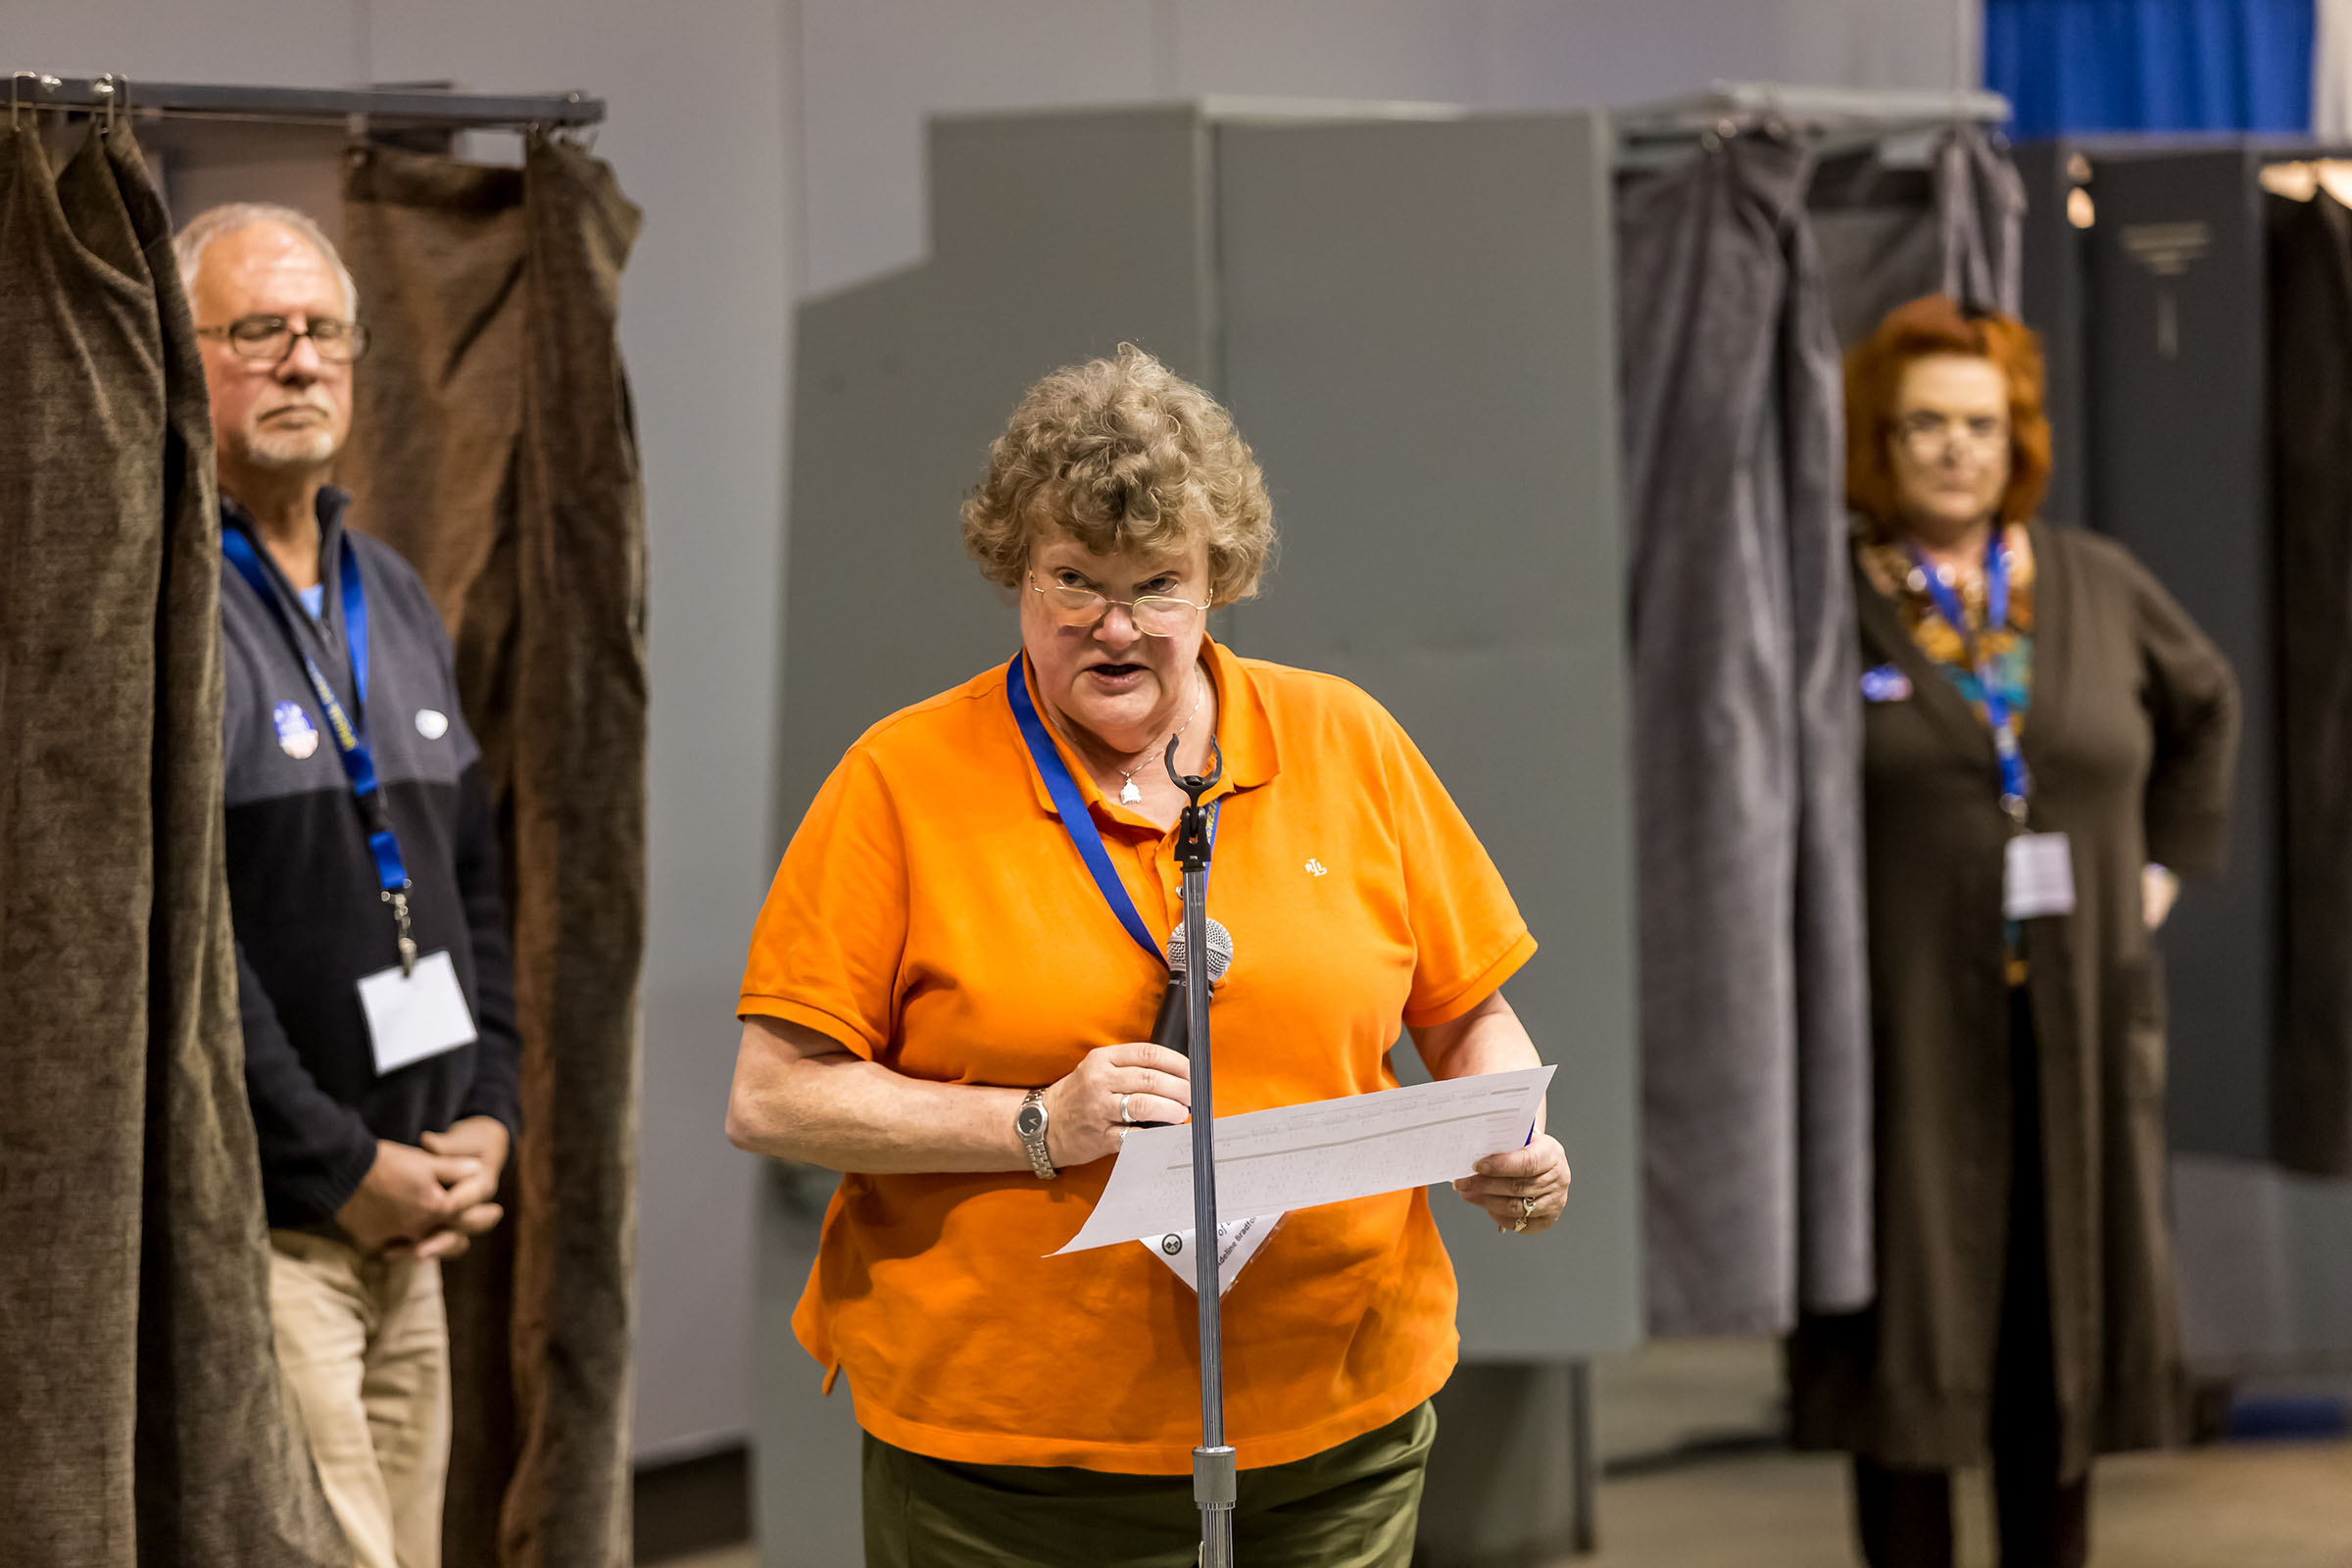 Ocean City Municipal Election Pivoting To Electronic Ballots